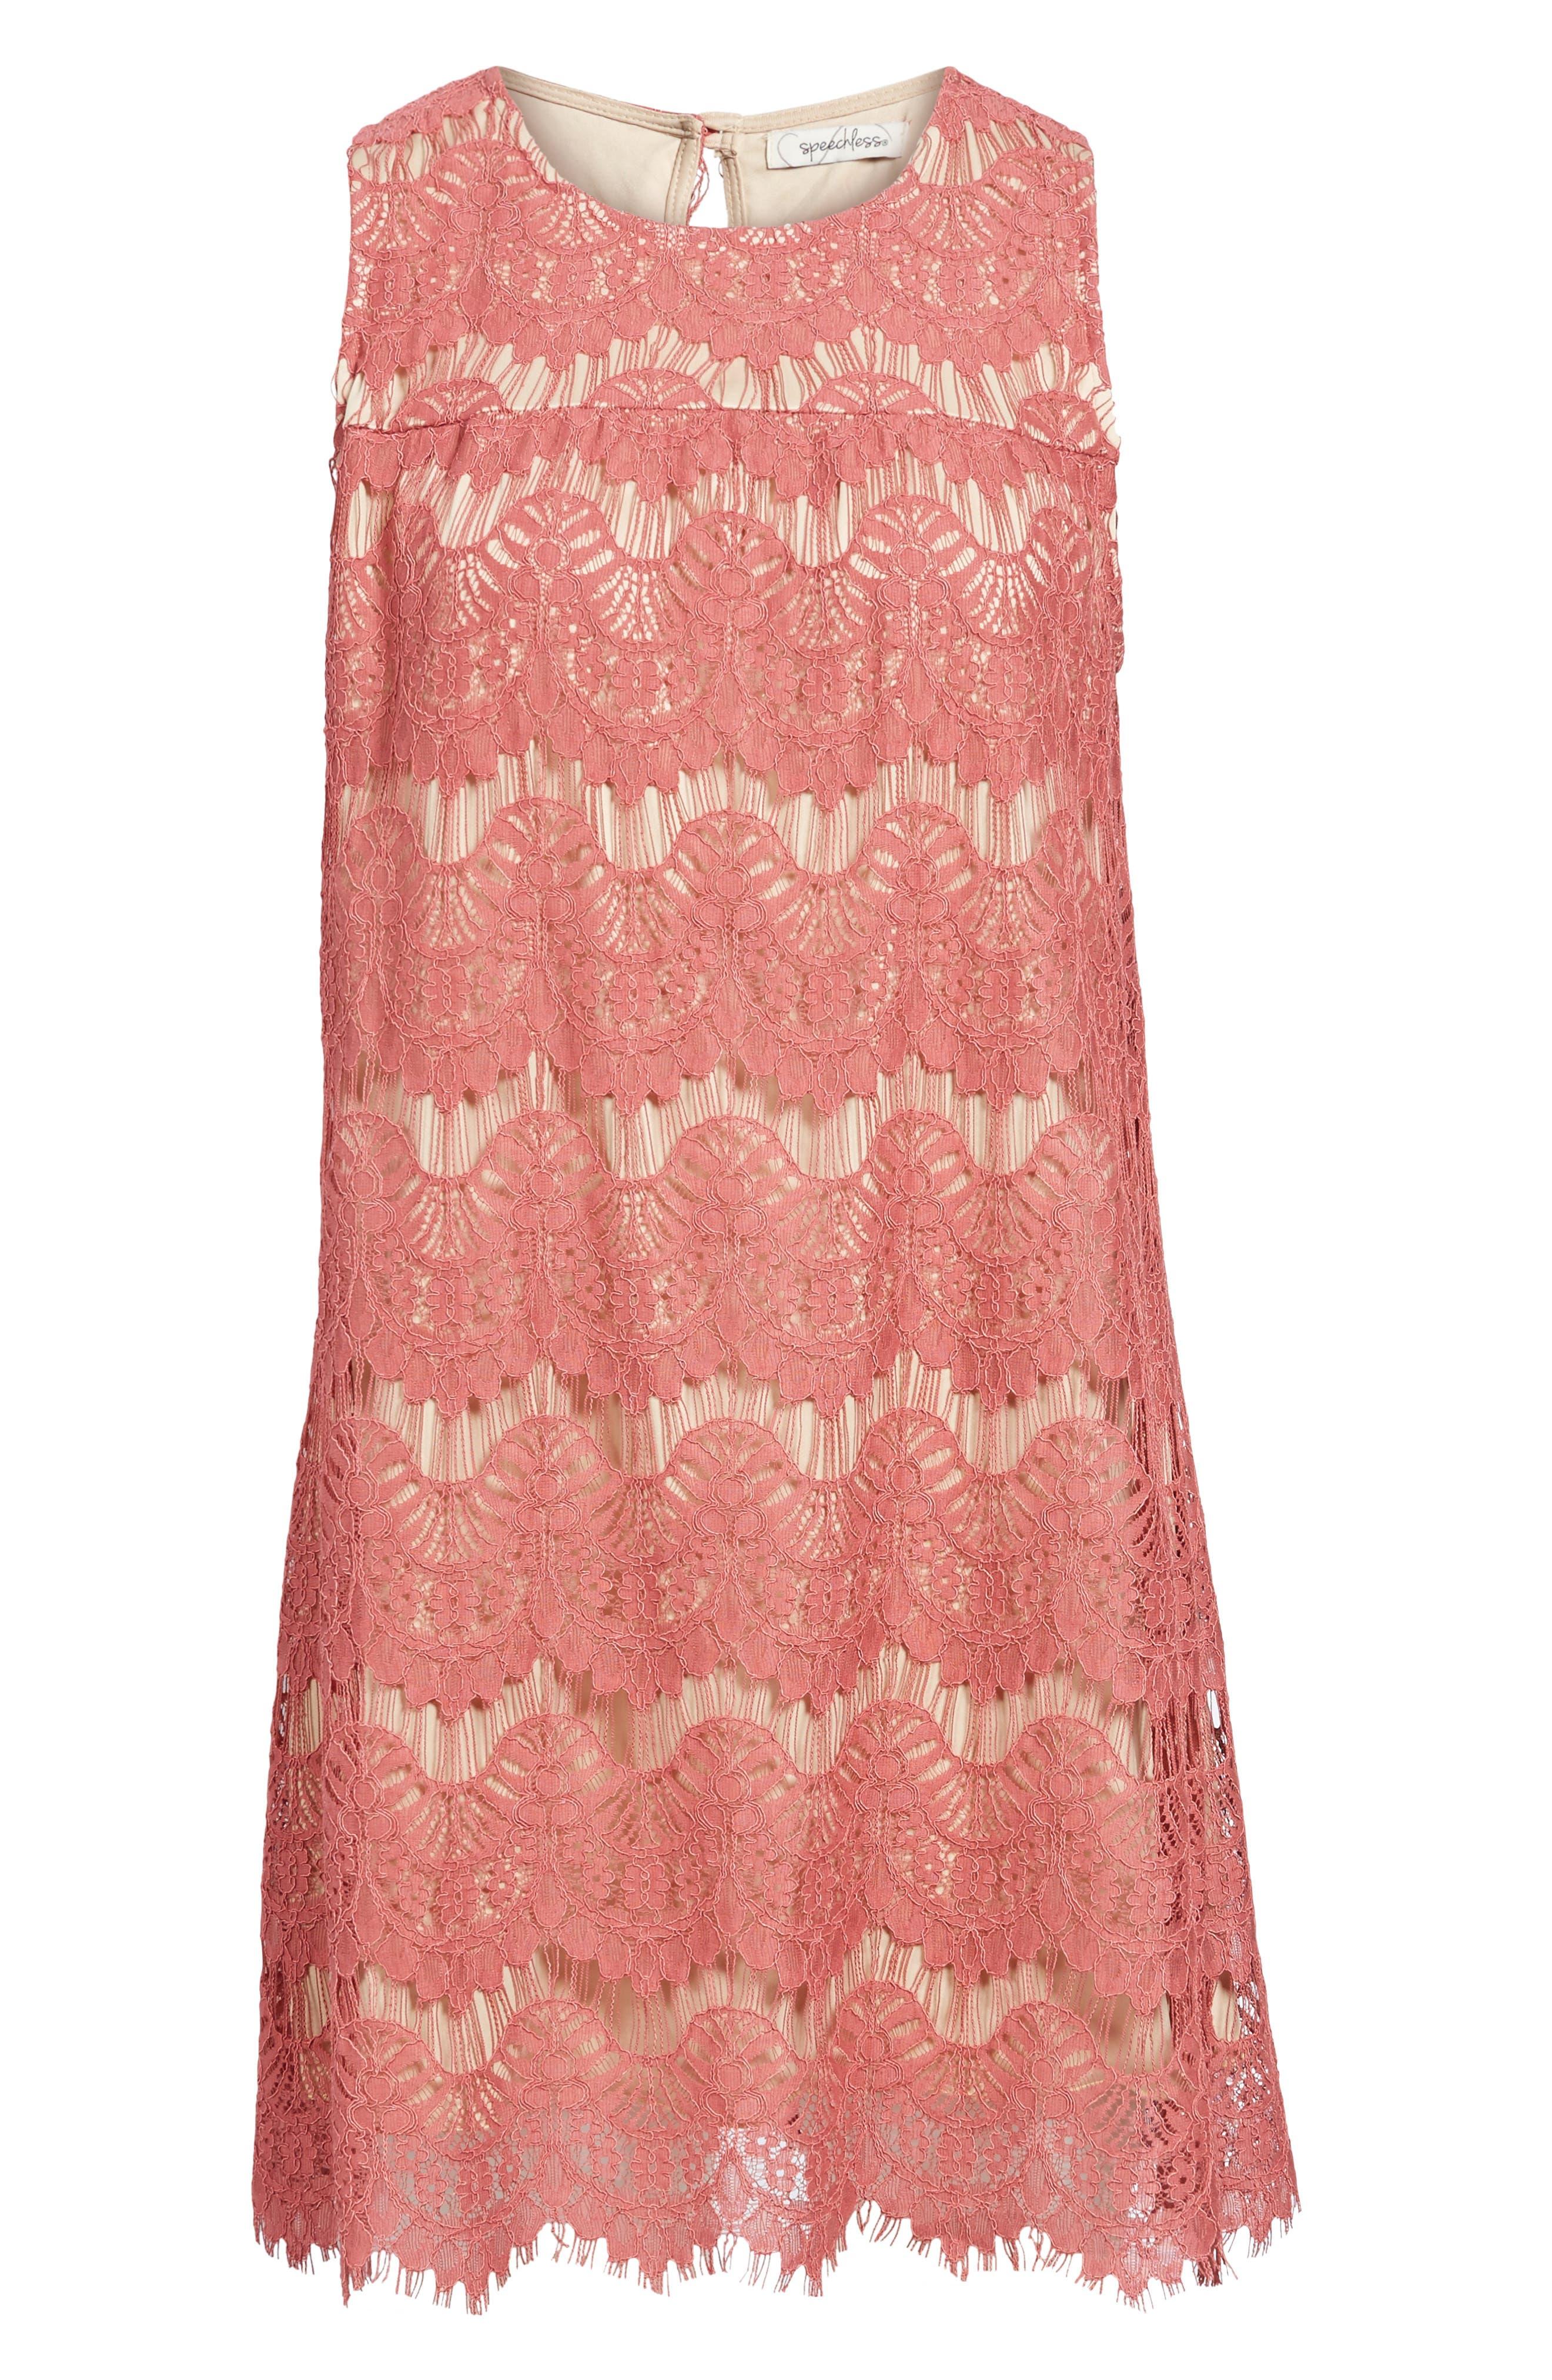 Lace Shift Dress,                             Alternate thumbnail 6, color,                             650